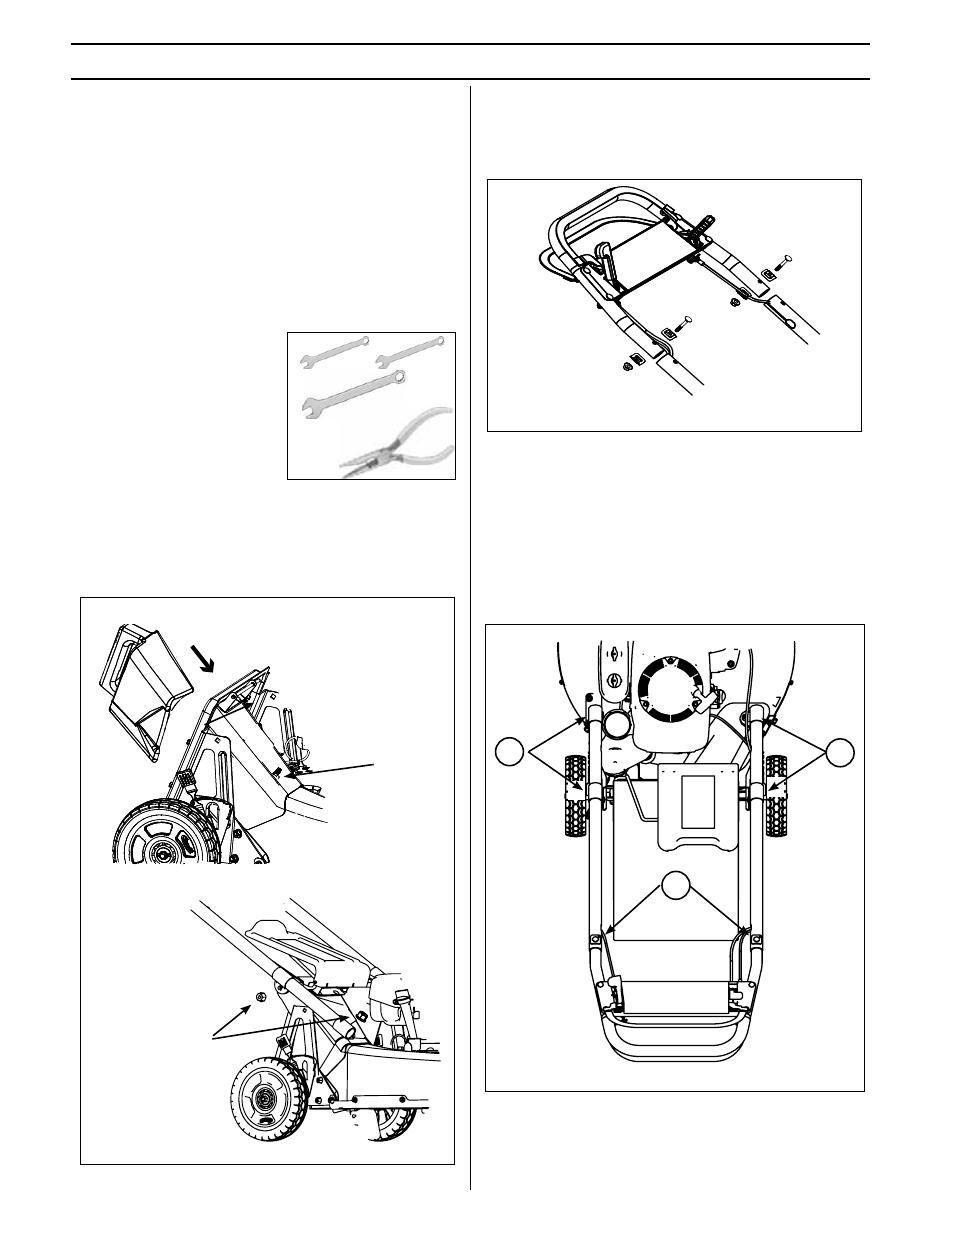 Assembly - setup | Ybravo BRAVO 21 Mower 21- 201 BBC